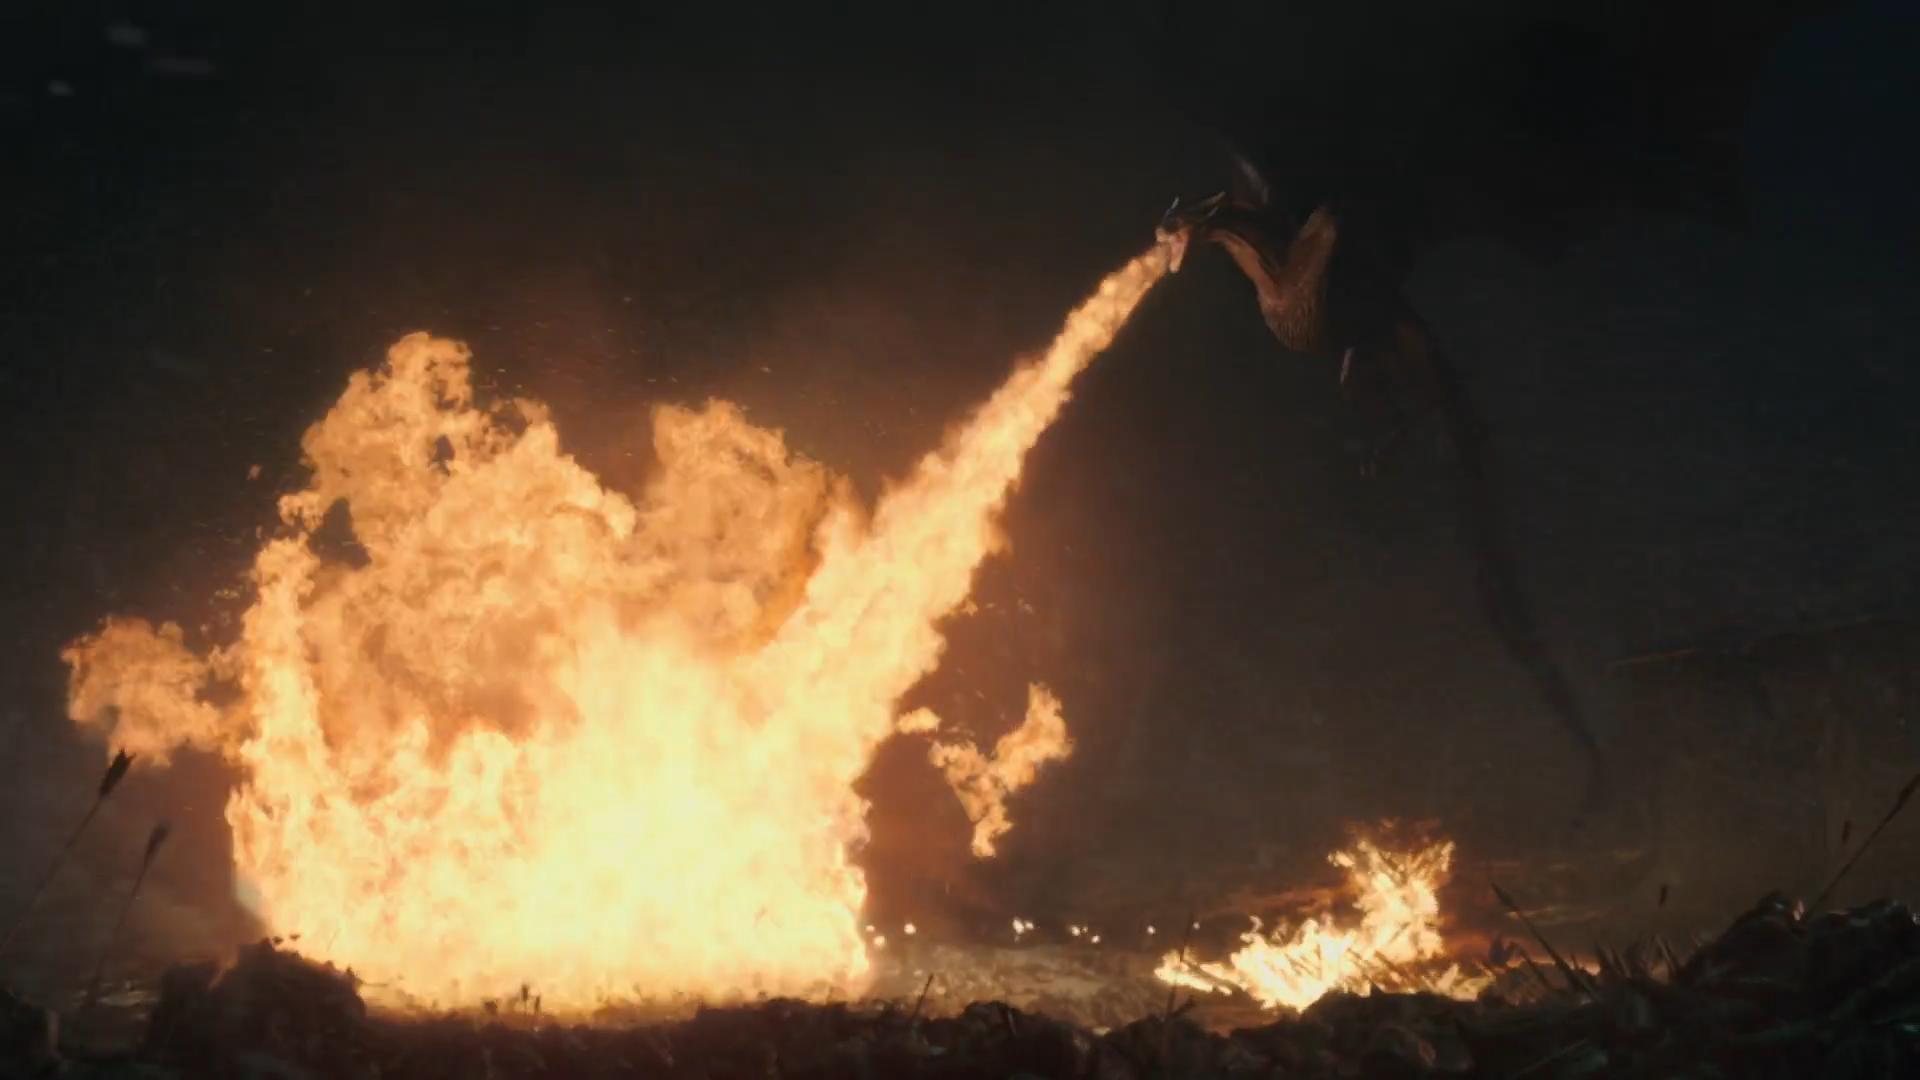 Game of Thrones Drogon Battle of Winterfell